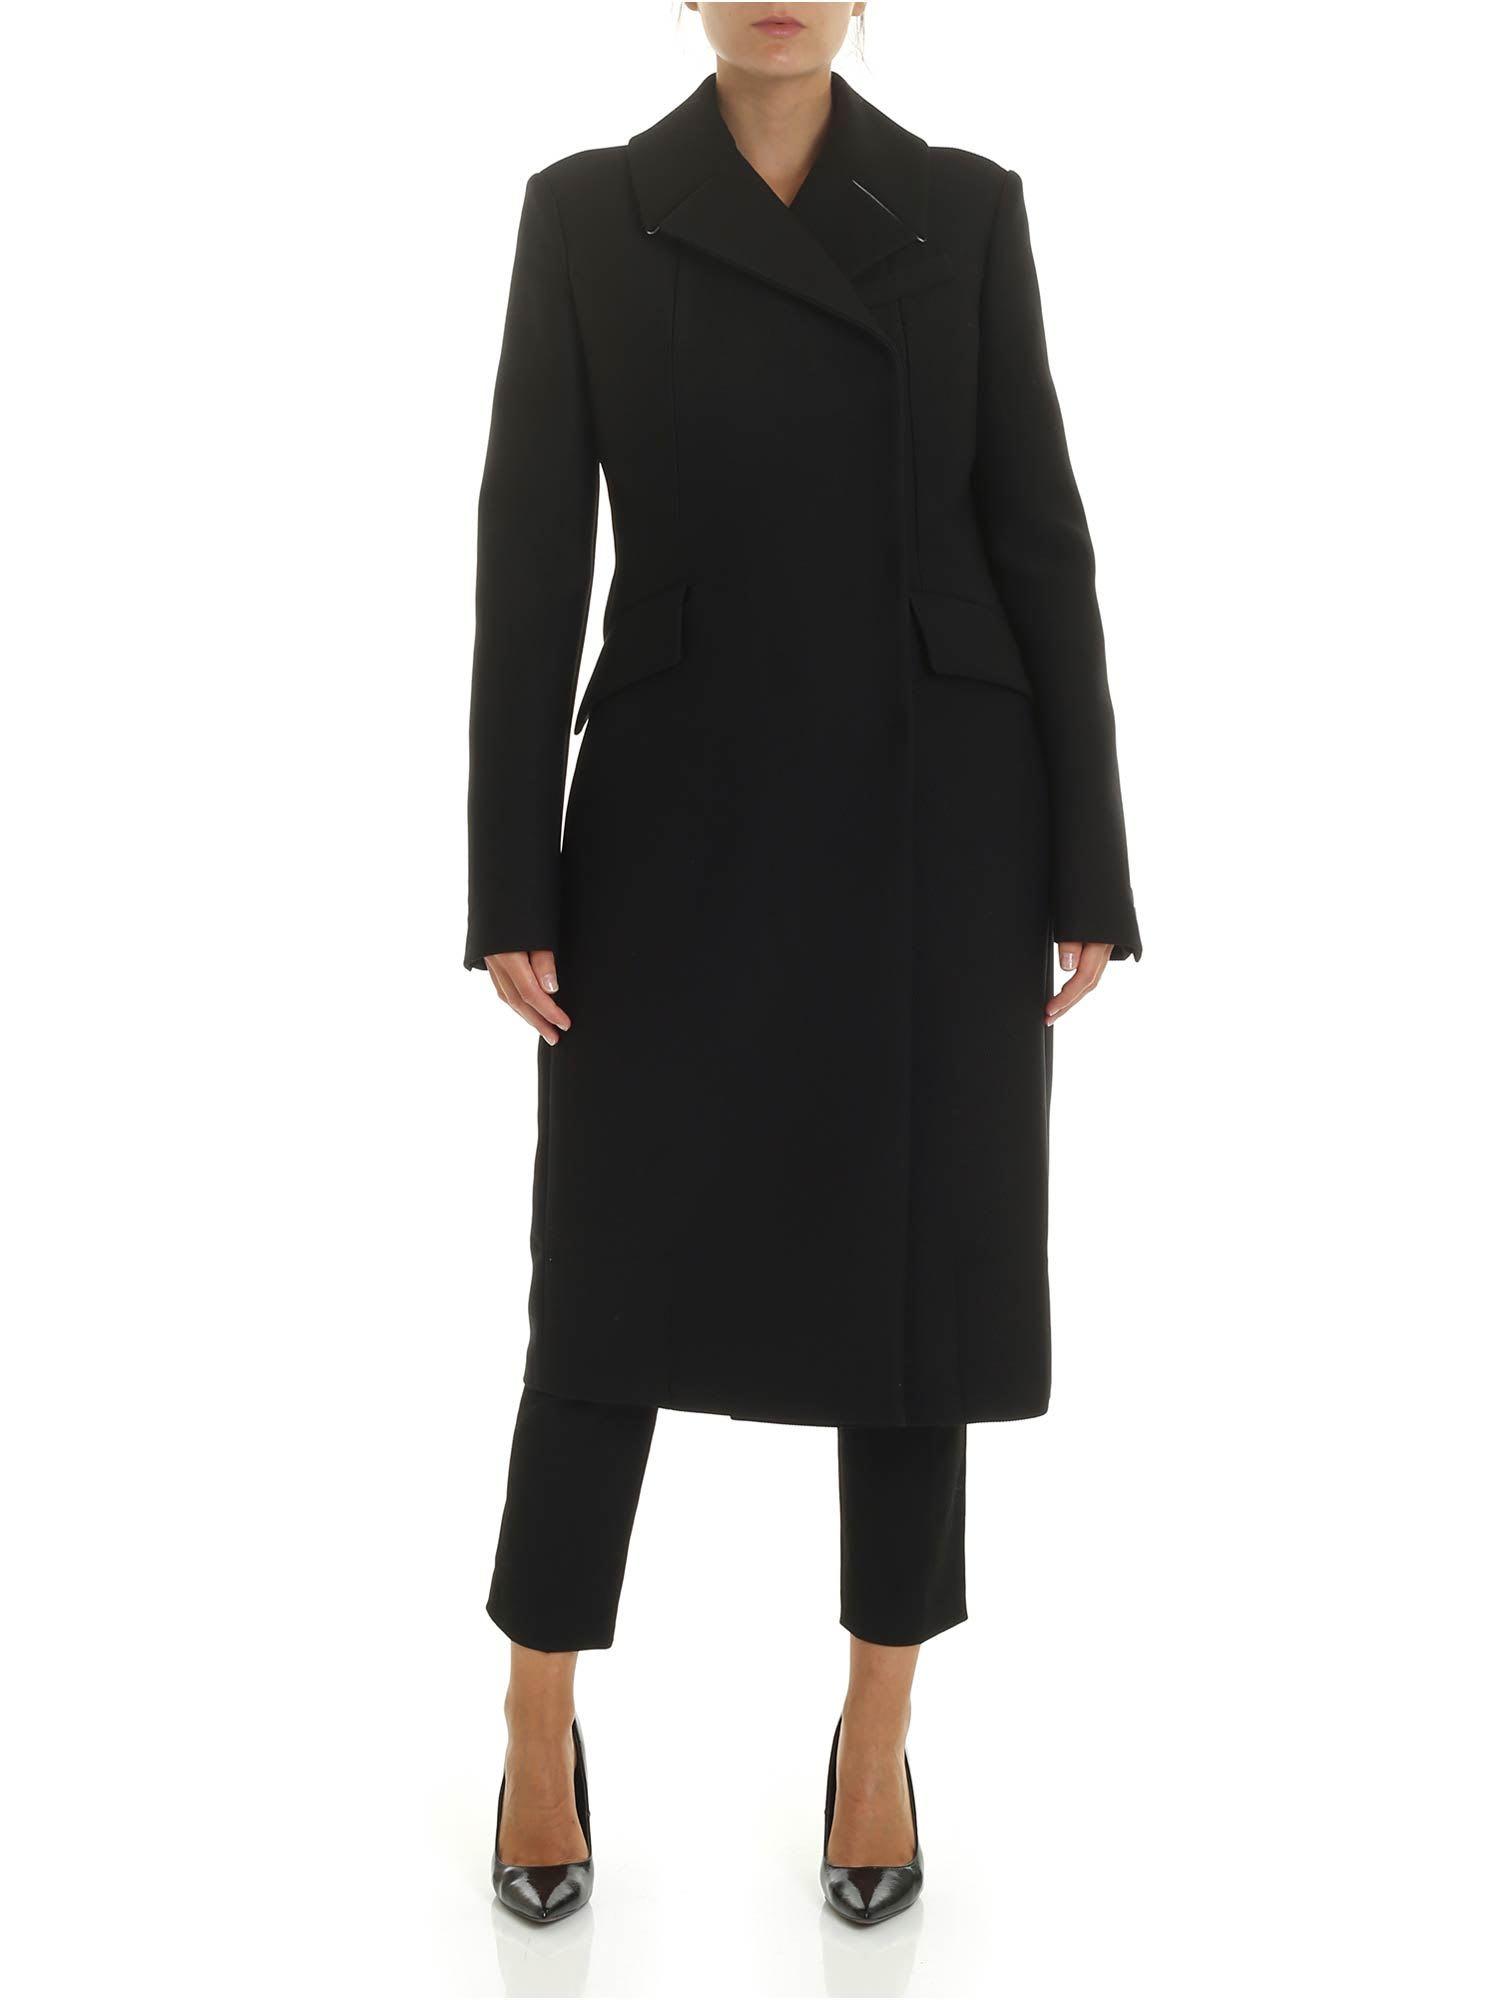 N°21 – Slim Fit Coat